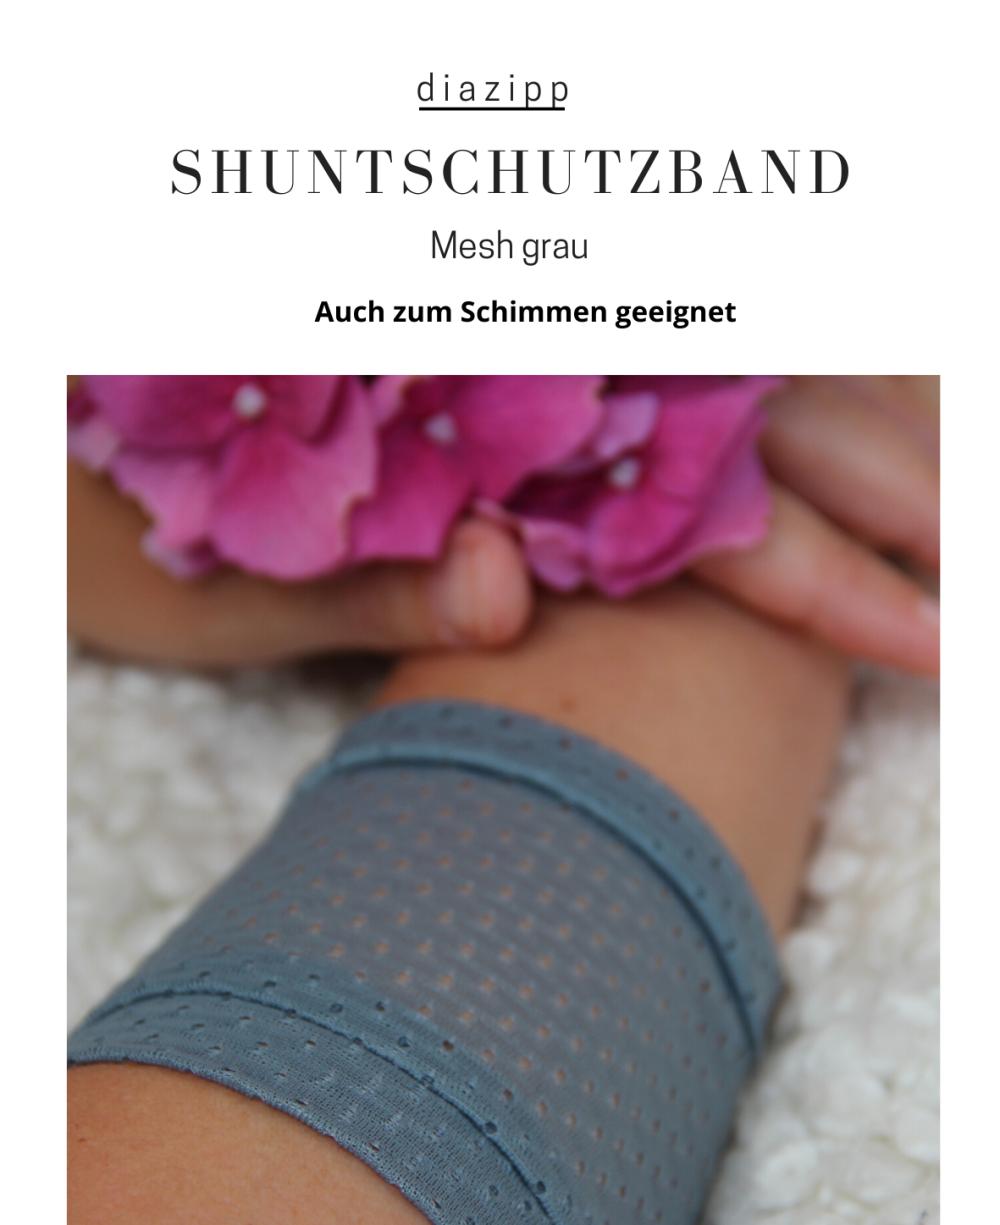 grau-damen-Mesh-Shuntschutzband-für-dialysepatienten-diazipp